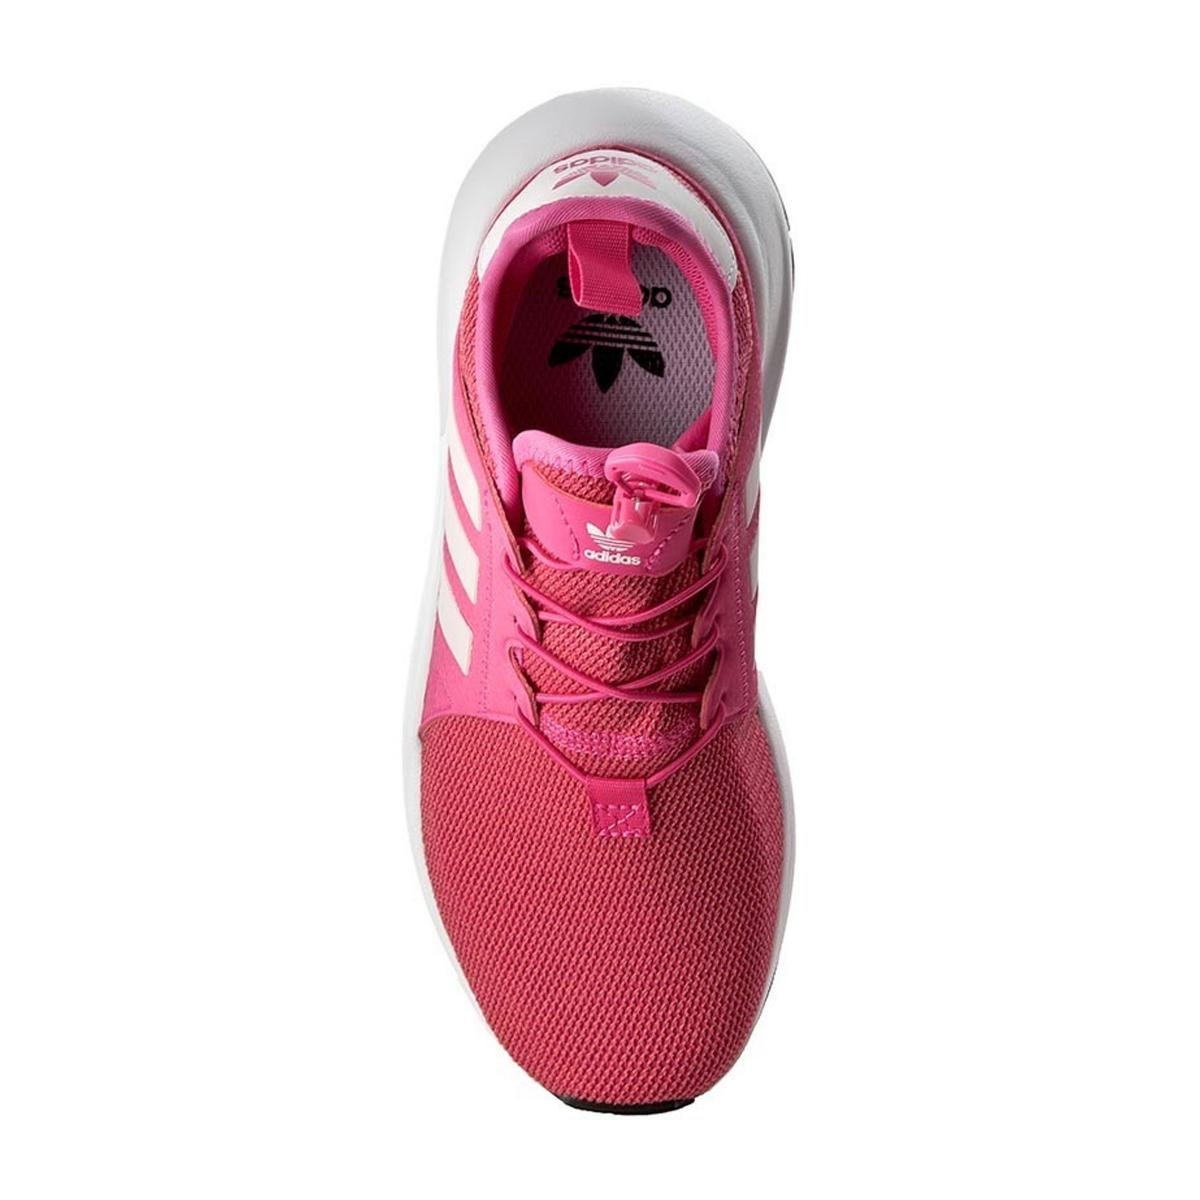 Scarpe Sneakers Adidas X_PRL J sportive da ragazza rif. BB2827